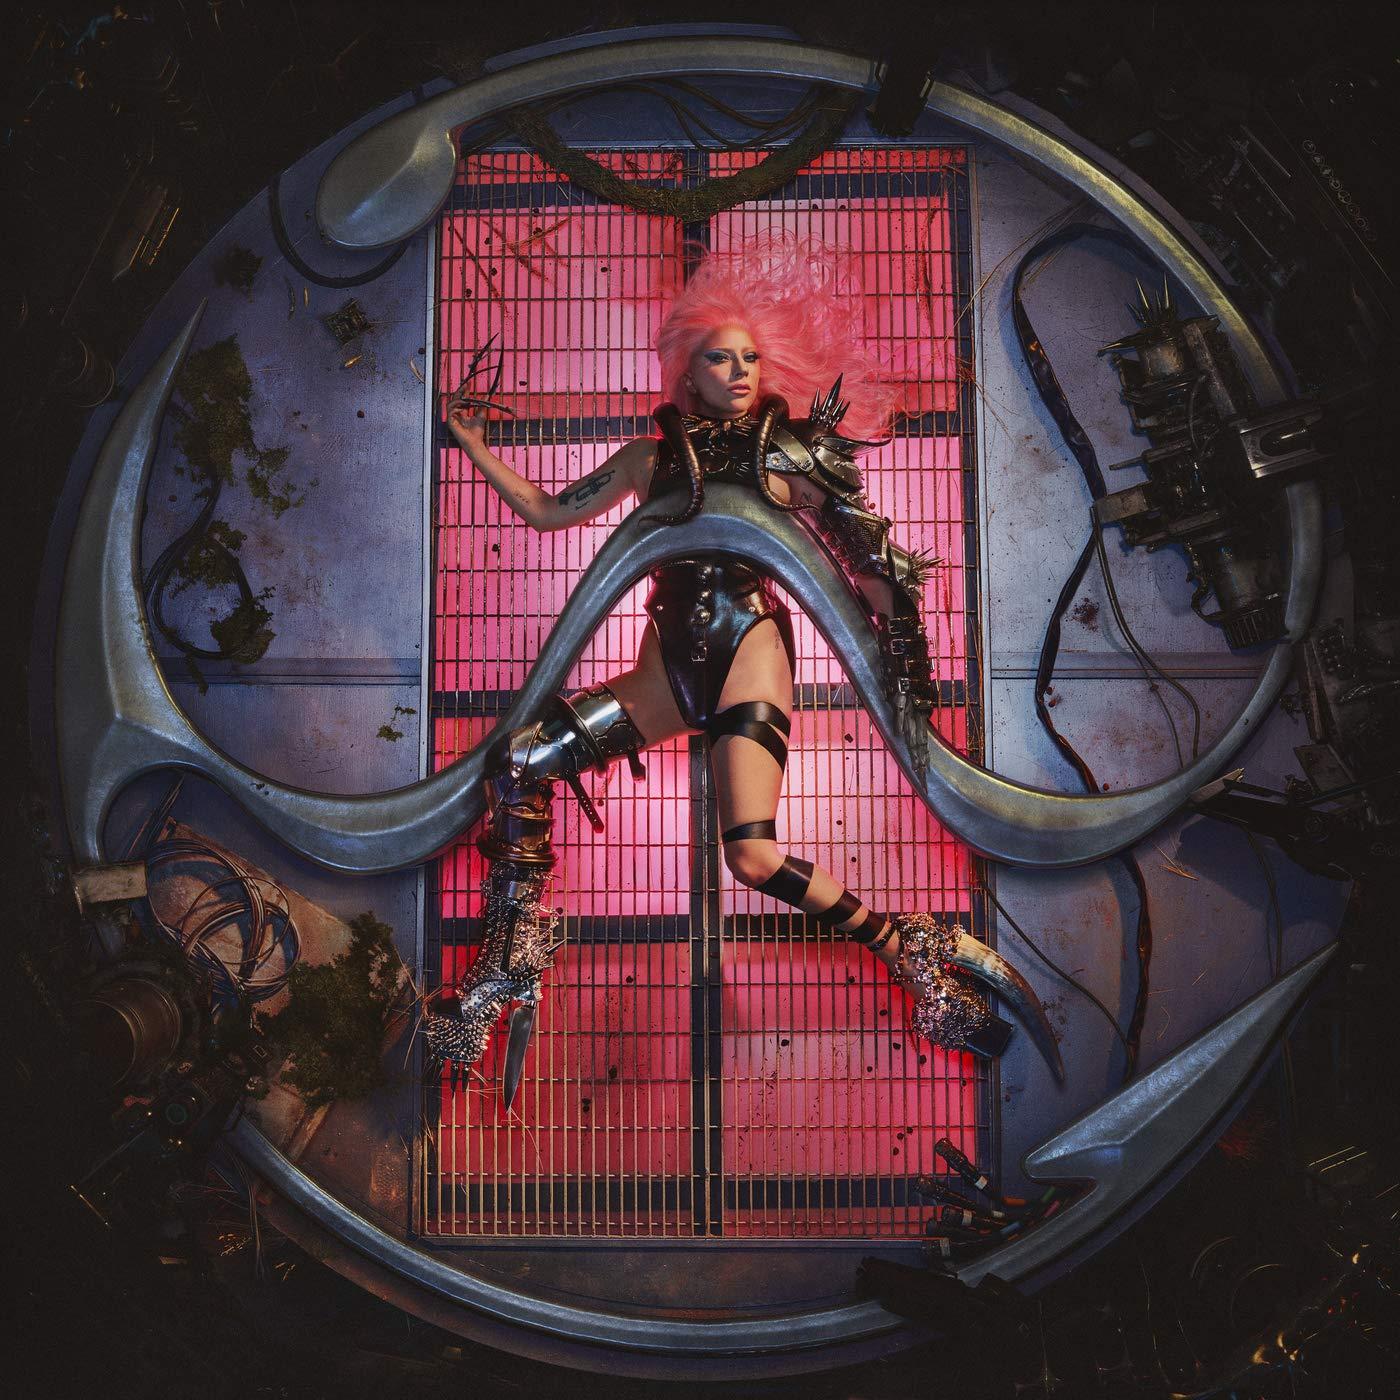 Cover: Chromatica von Lady Gaga 1 CD (circa 42 min)